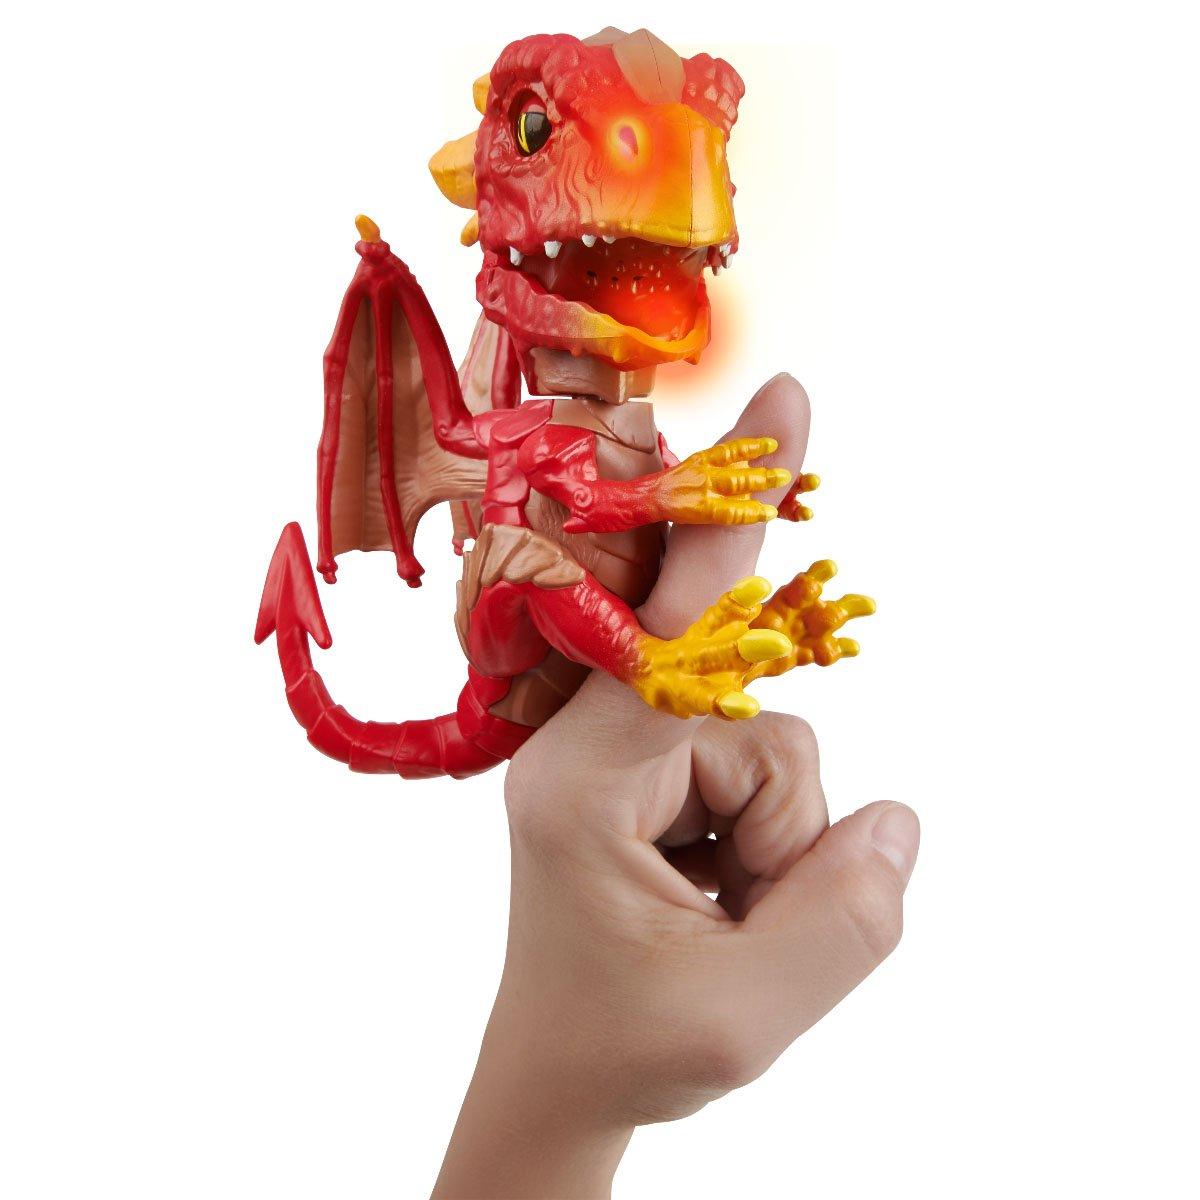 Figurina interactiva Fingerlings - Untamed Dragon Fire